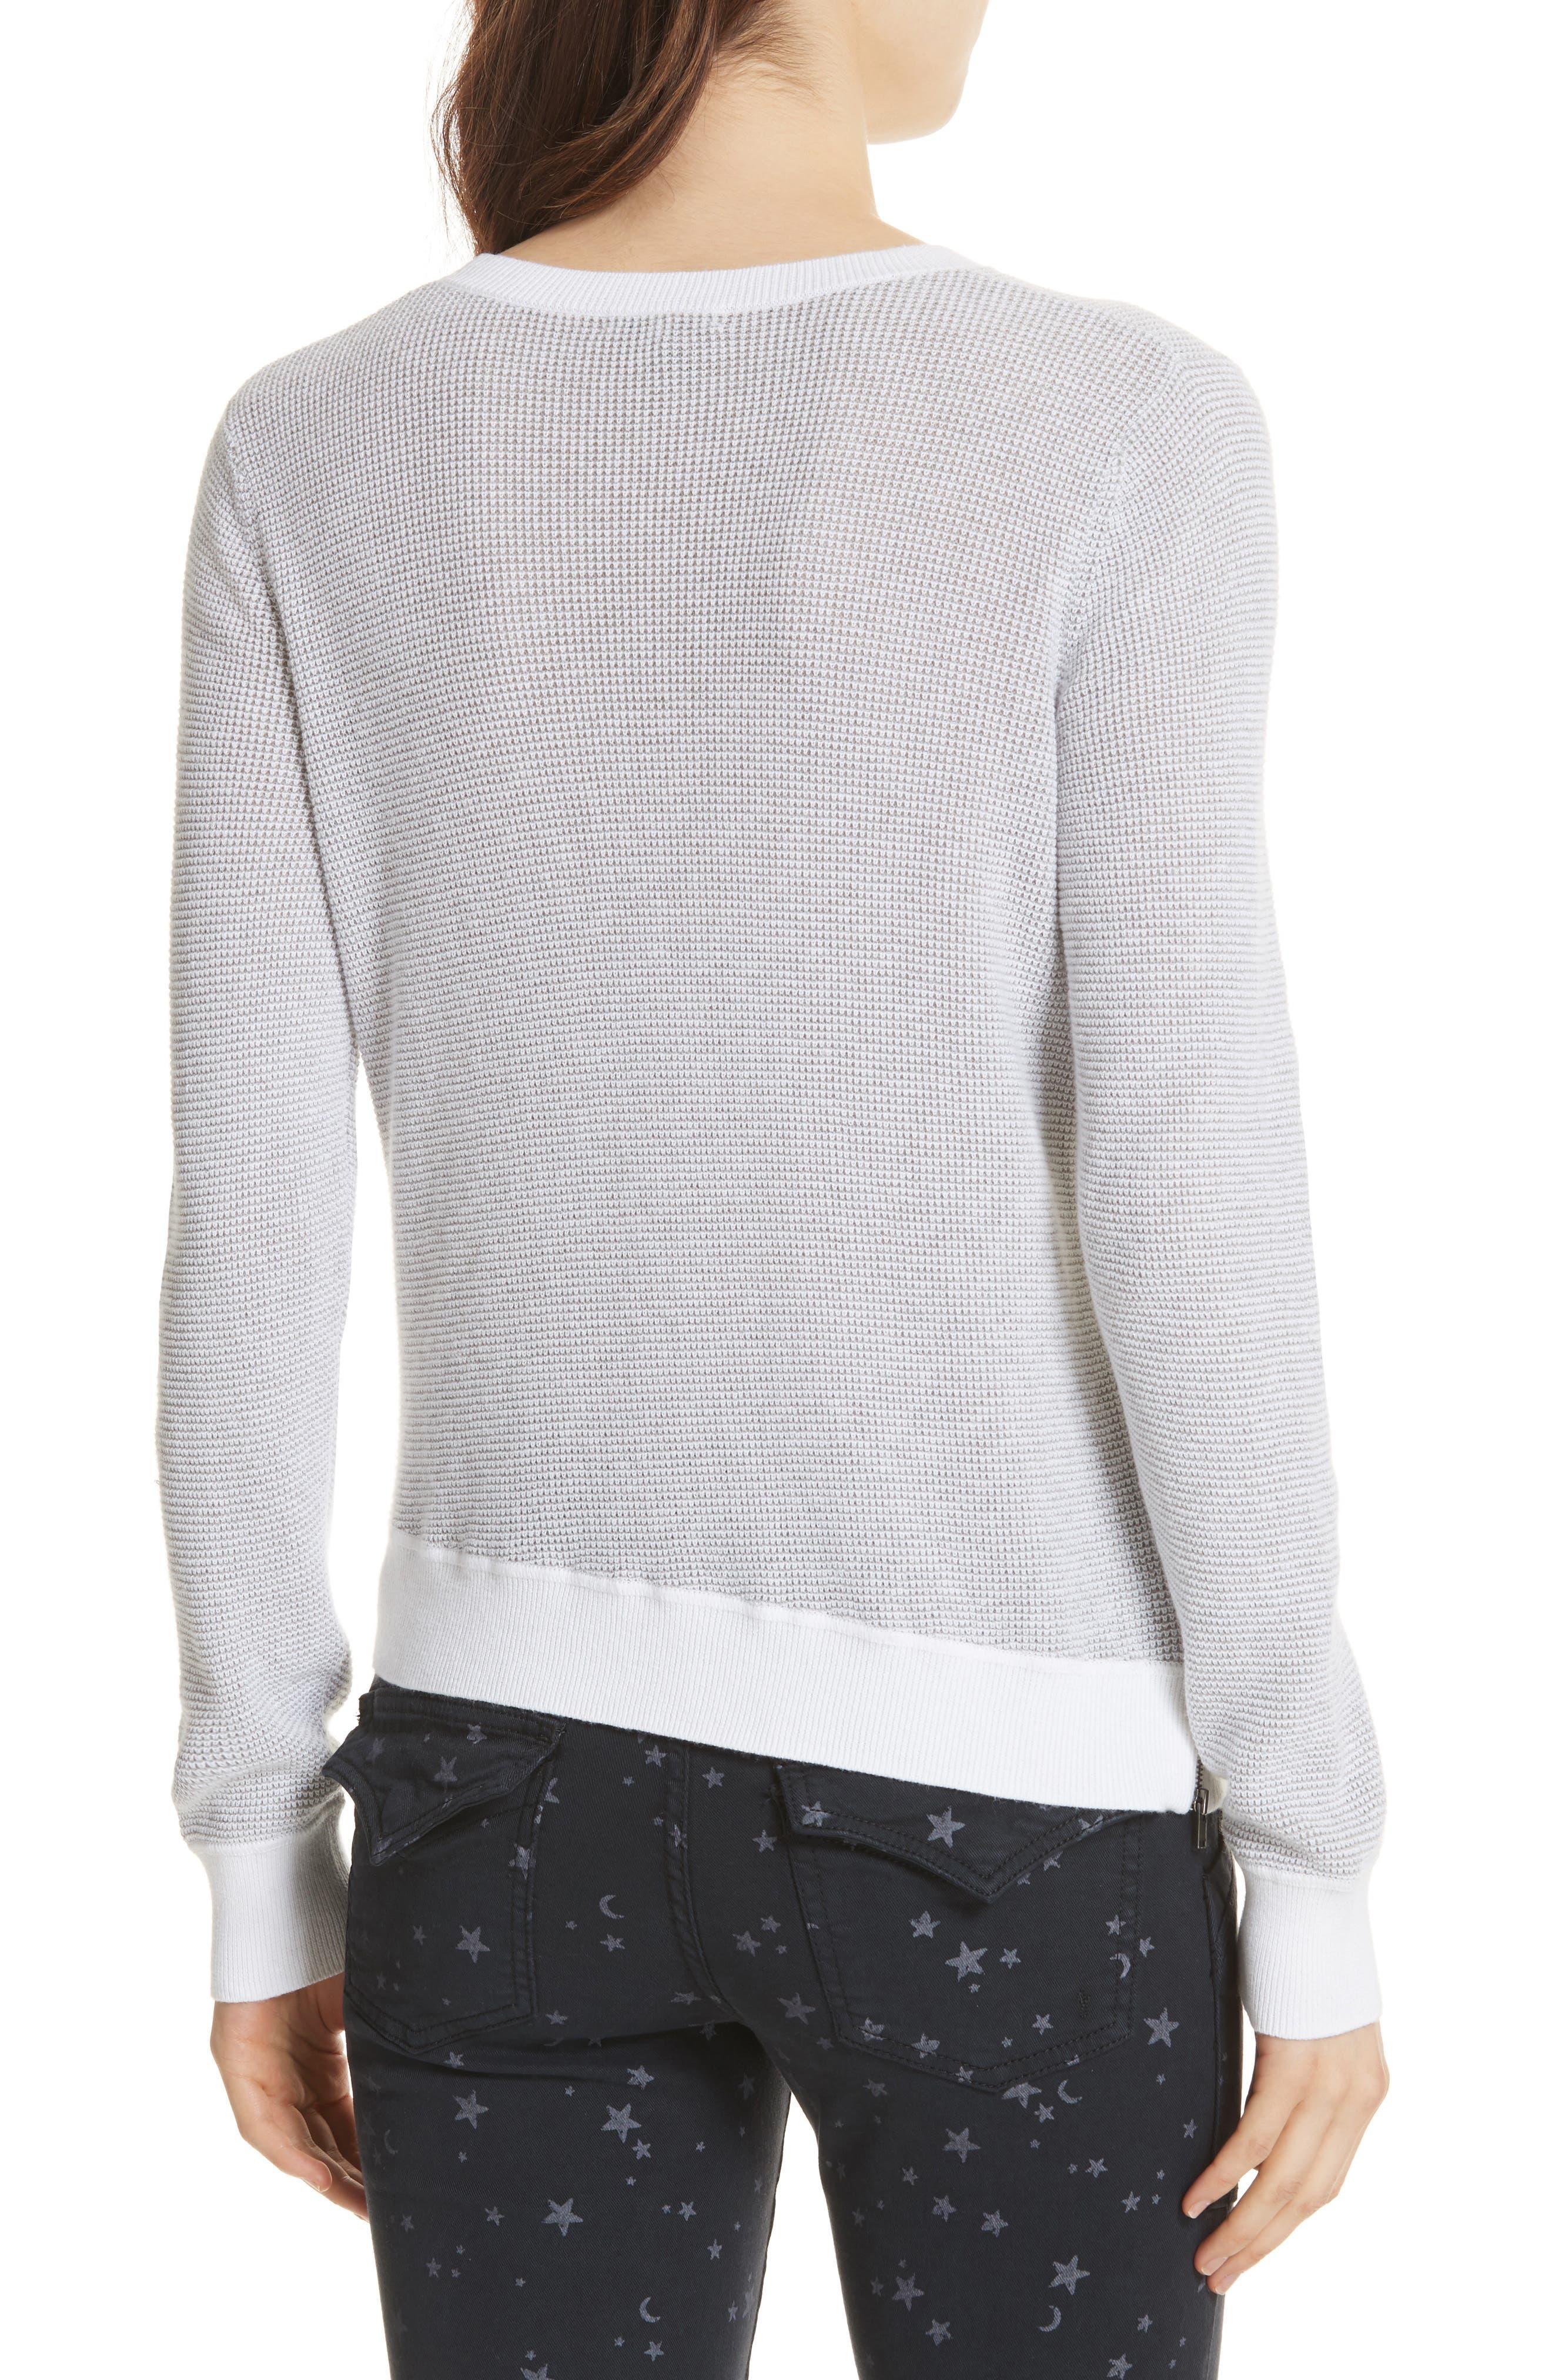 Laurana Cotton & Cashmere Sweater,                             Alternate thumbnail 2, color,                             Porcelain/ Heather Grey